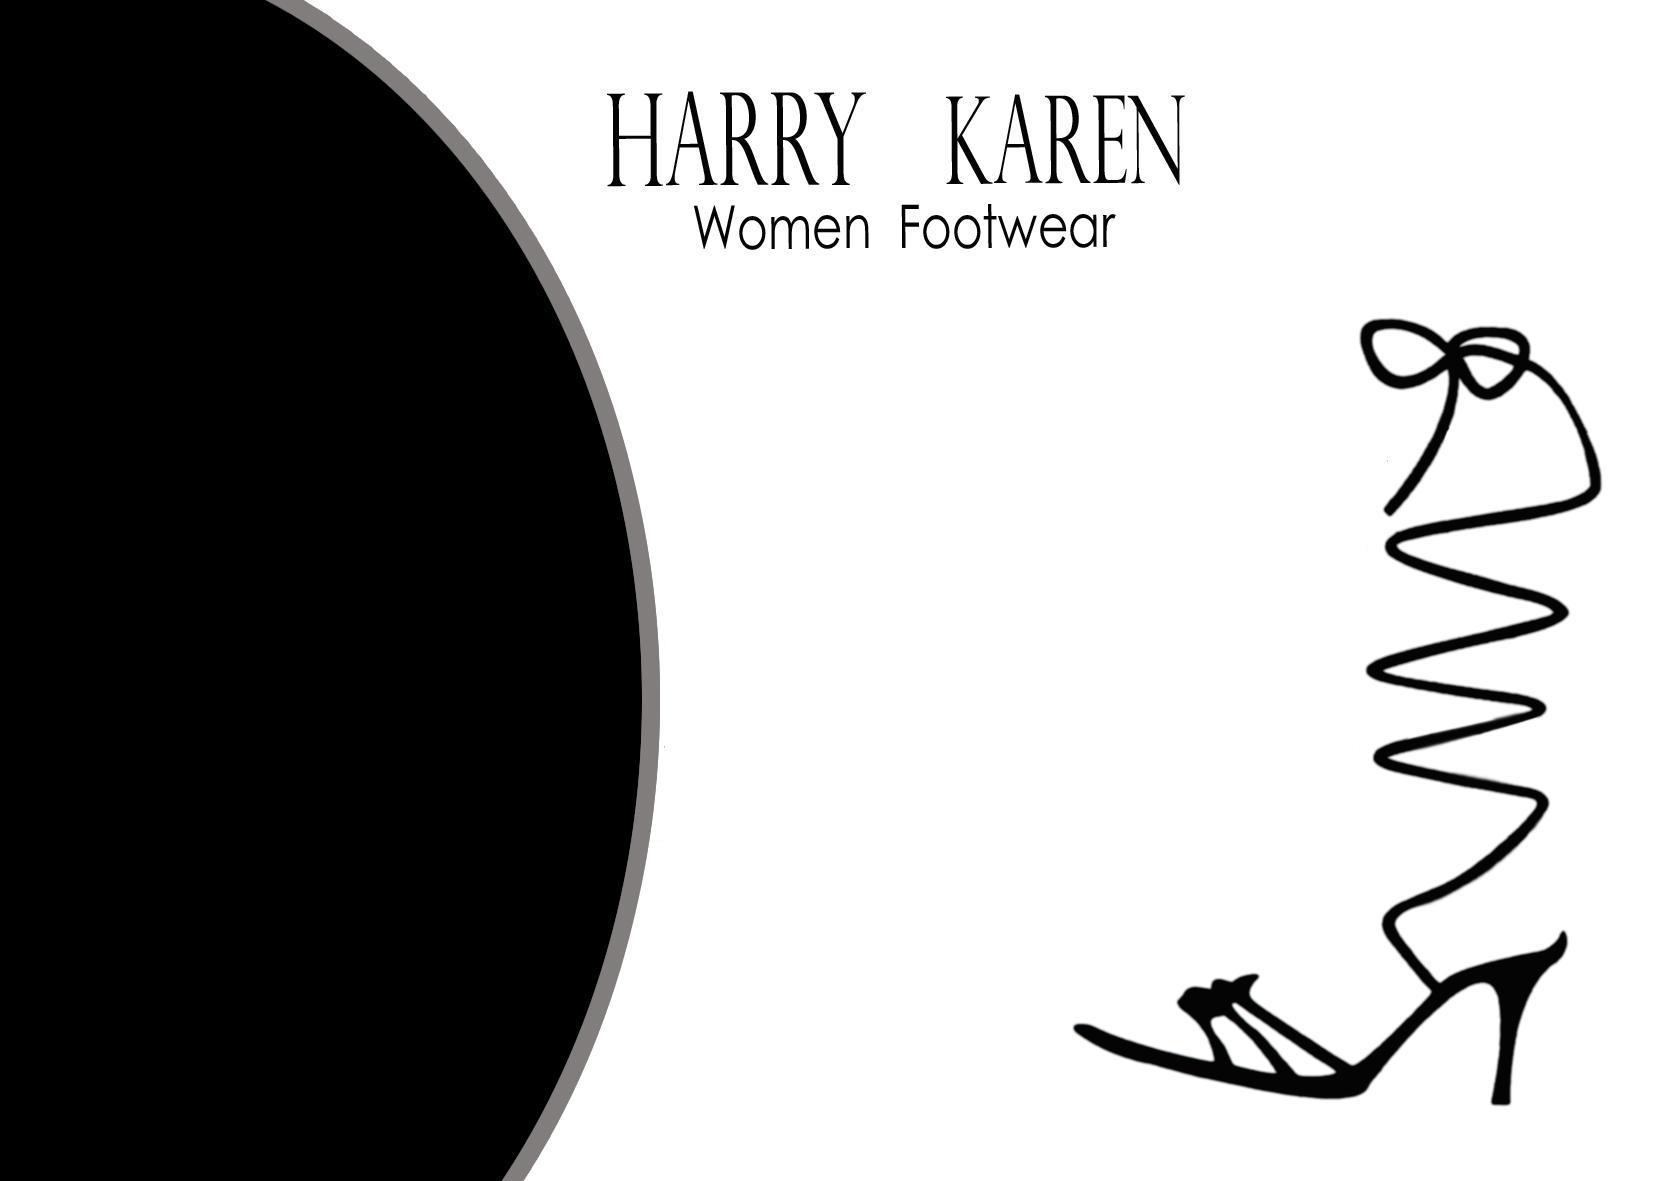 سلسلة محلات هارى كارين